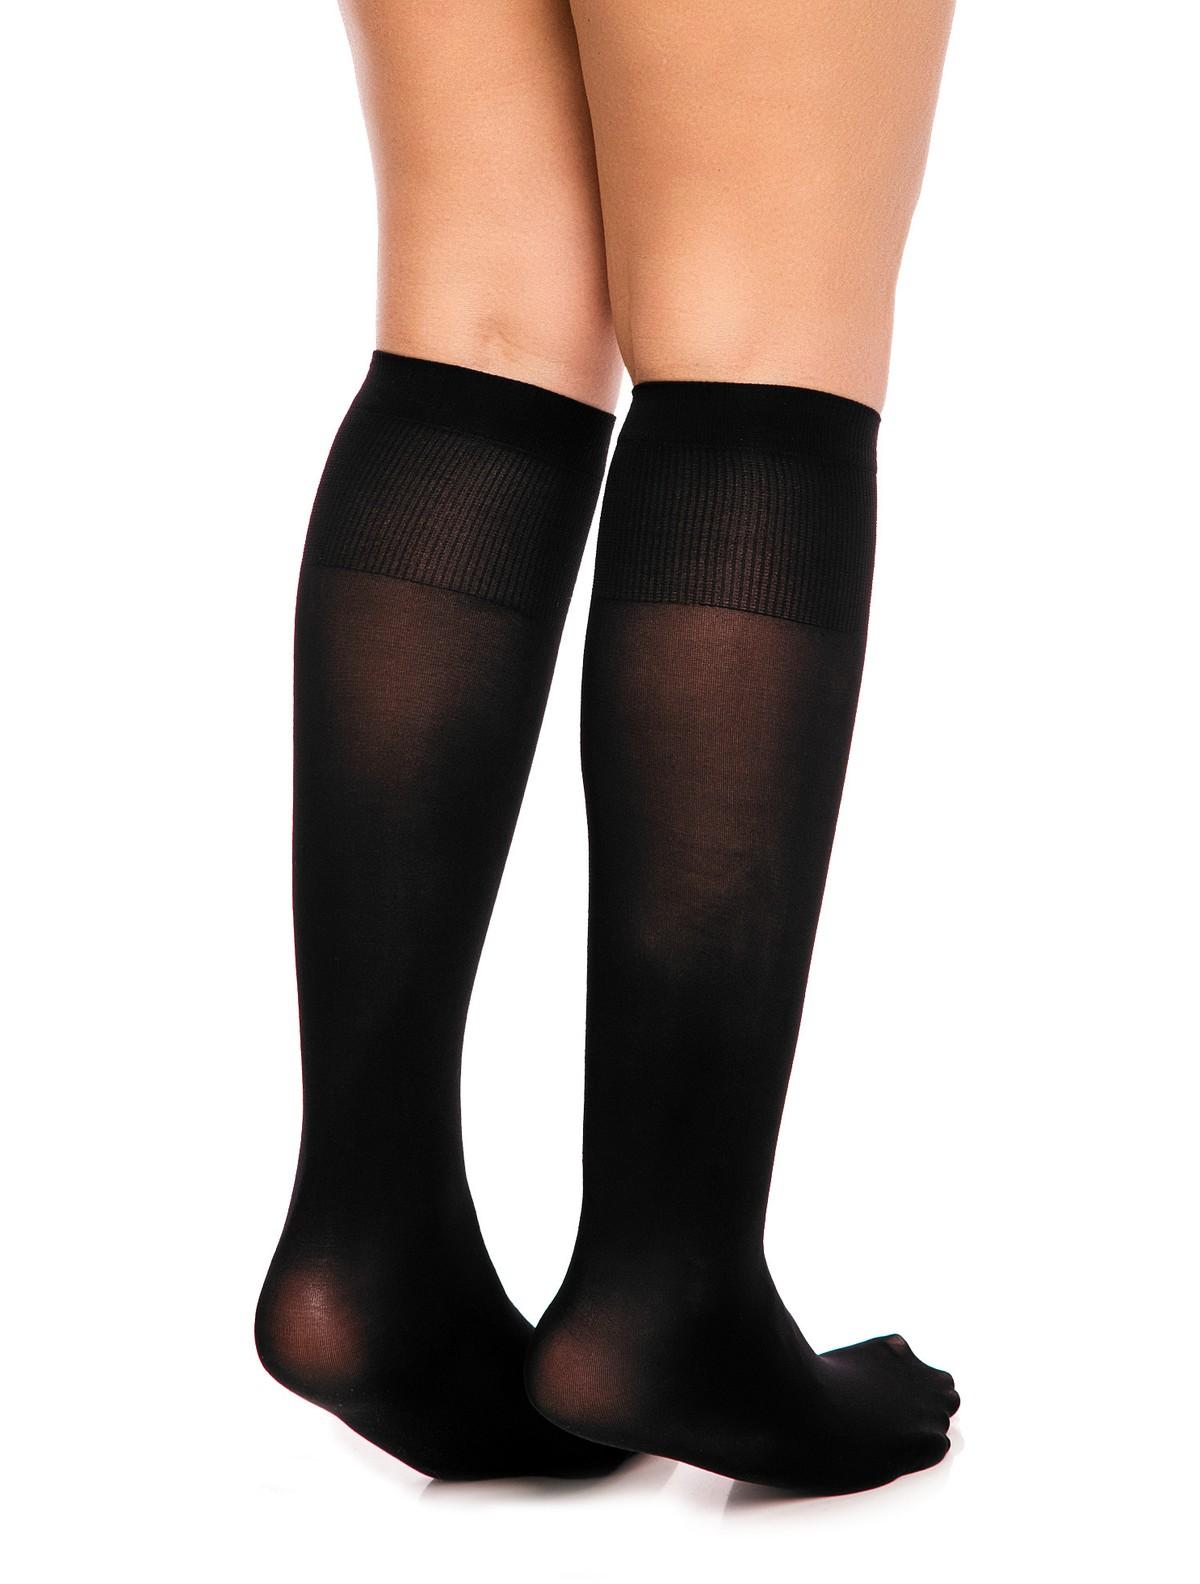 112dae8fe3b Glamory Fit 50 Microfiber Knee High Socks black ...